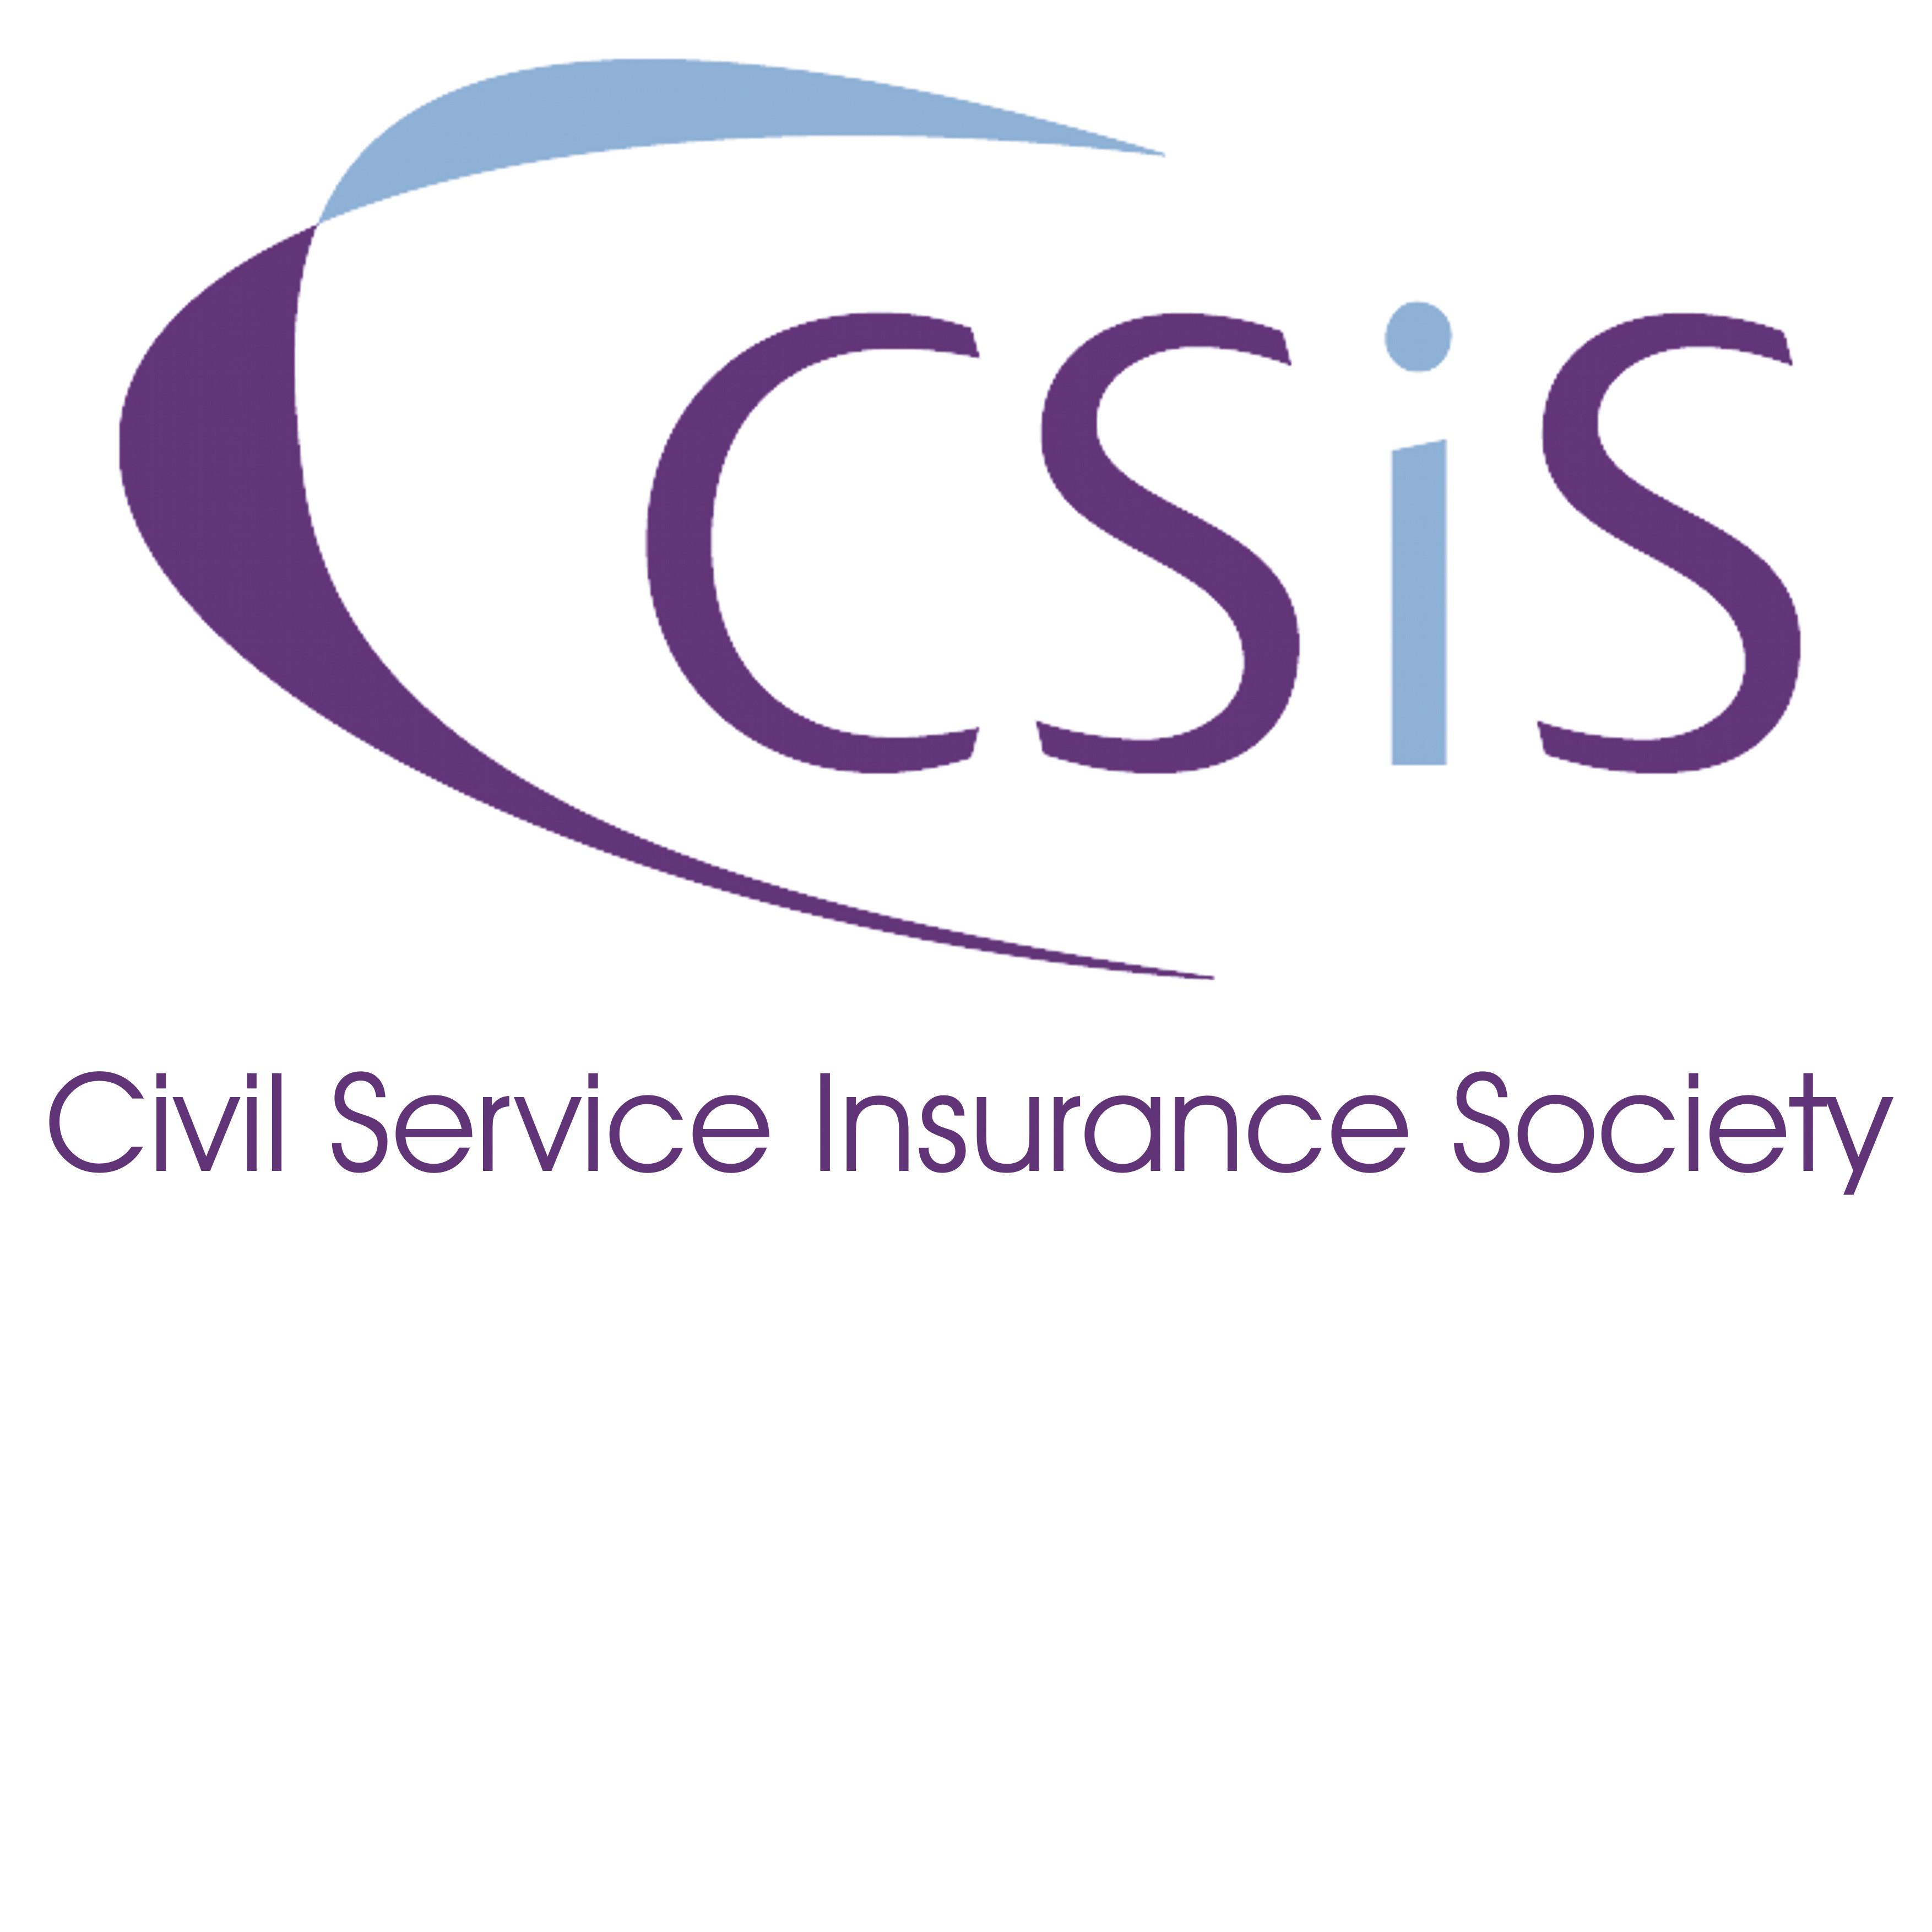 Civil Service Insurance Society